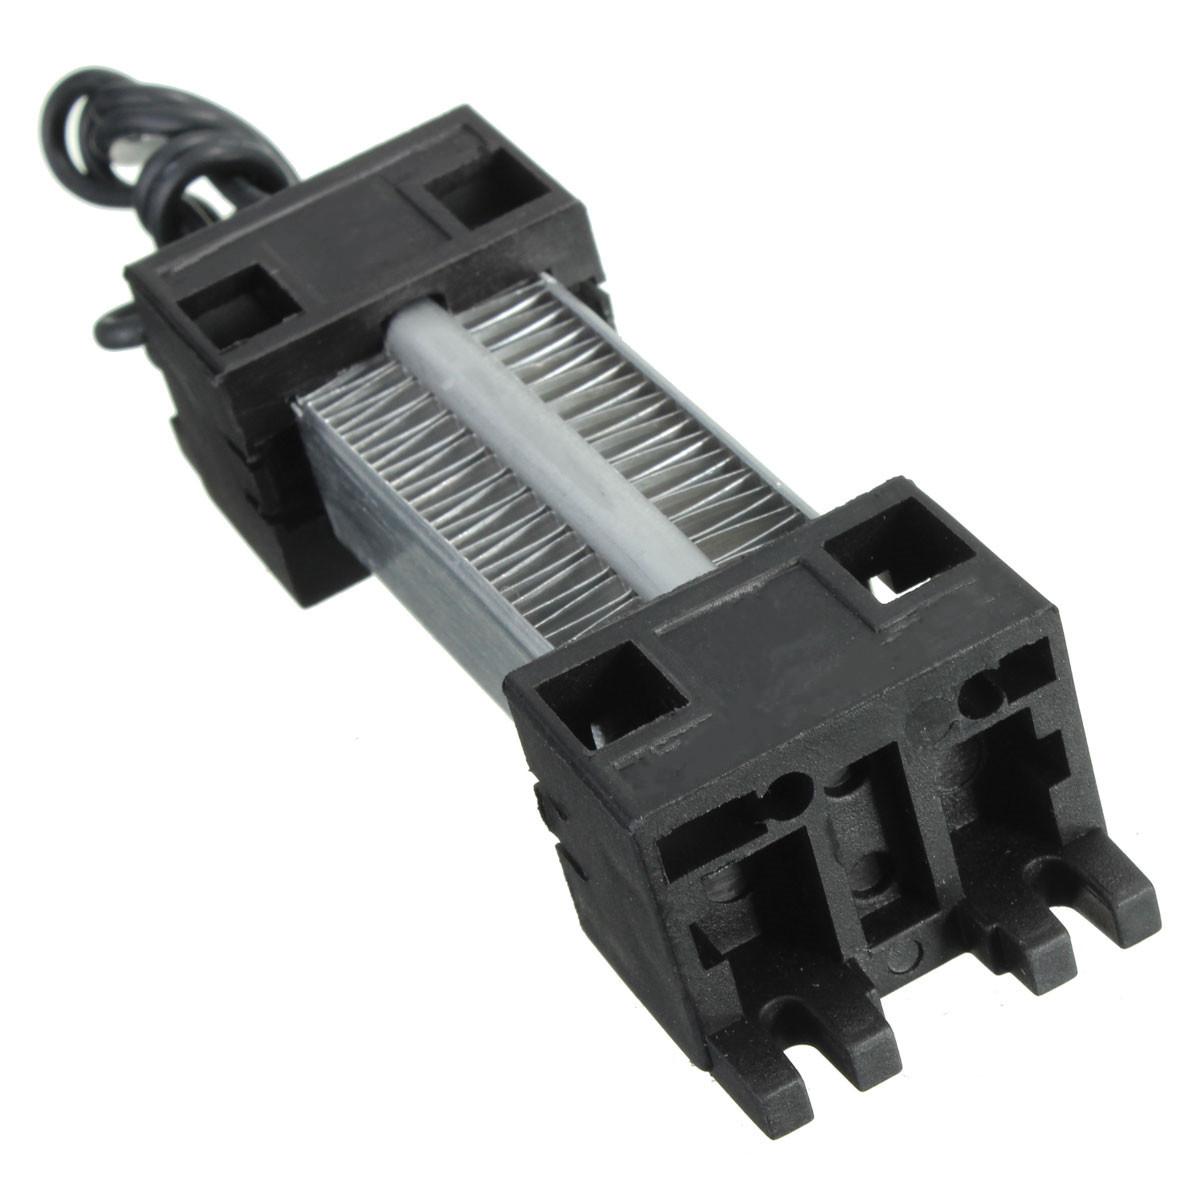 12v 100w Ptc Heating Element Heater Electric Heater